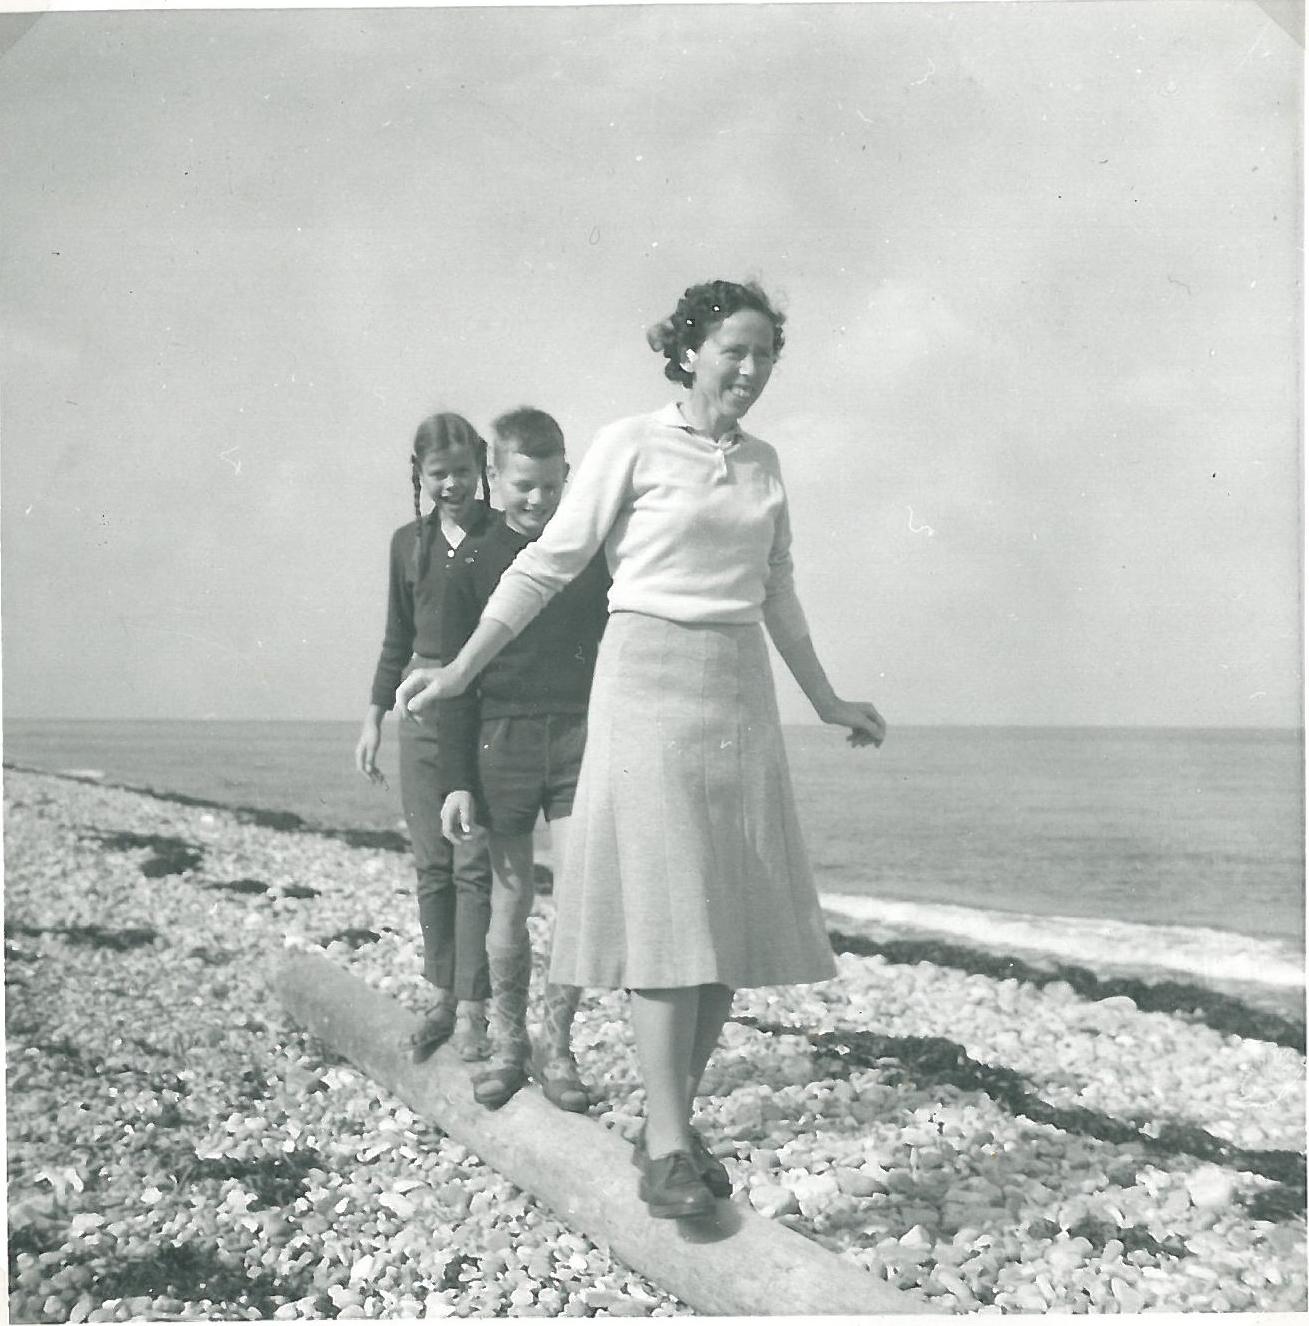 Vejby Strand august 1962. Min mor Ruth og Torben og jeg på line